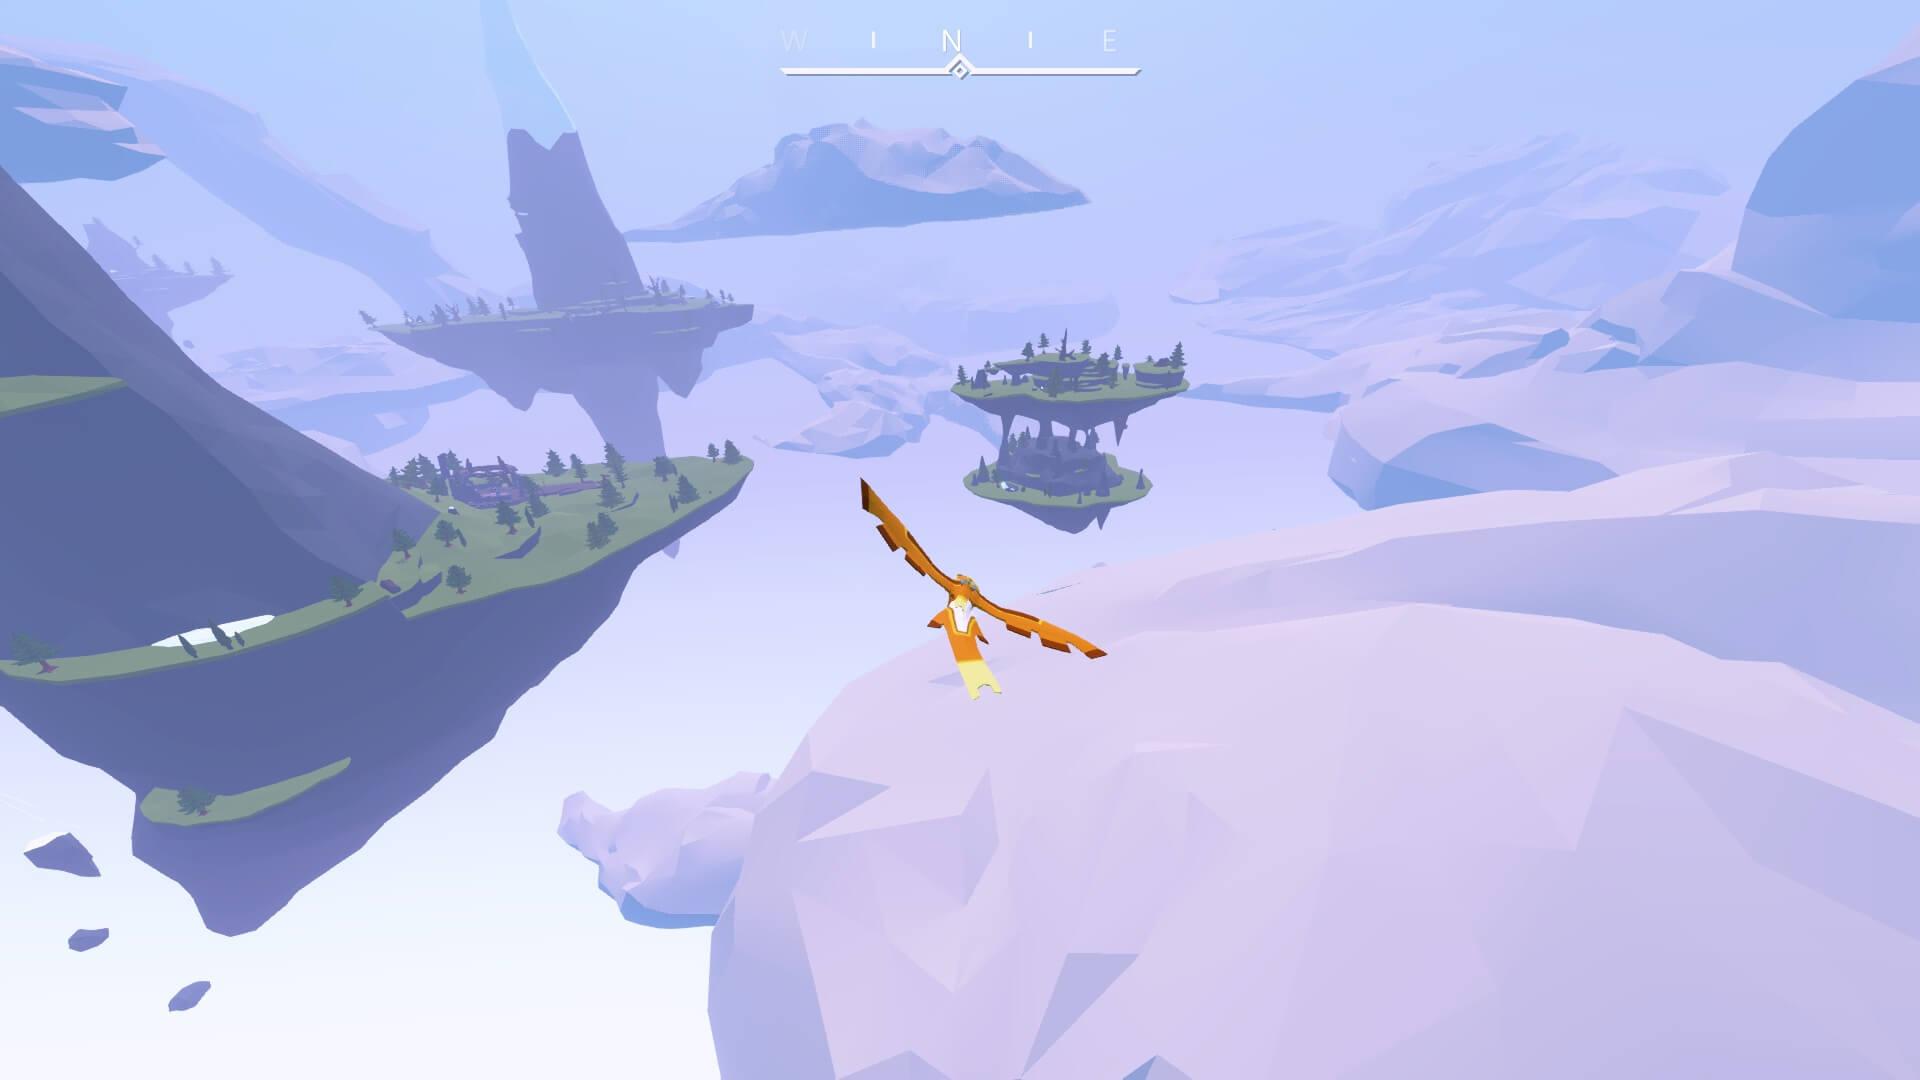 Epic-games-ucretsiz-oyunlar-aer-memories-of-old